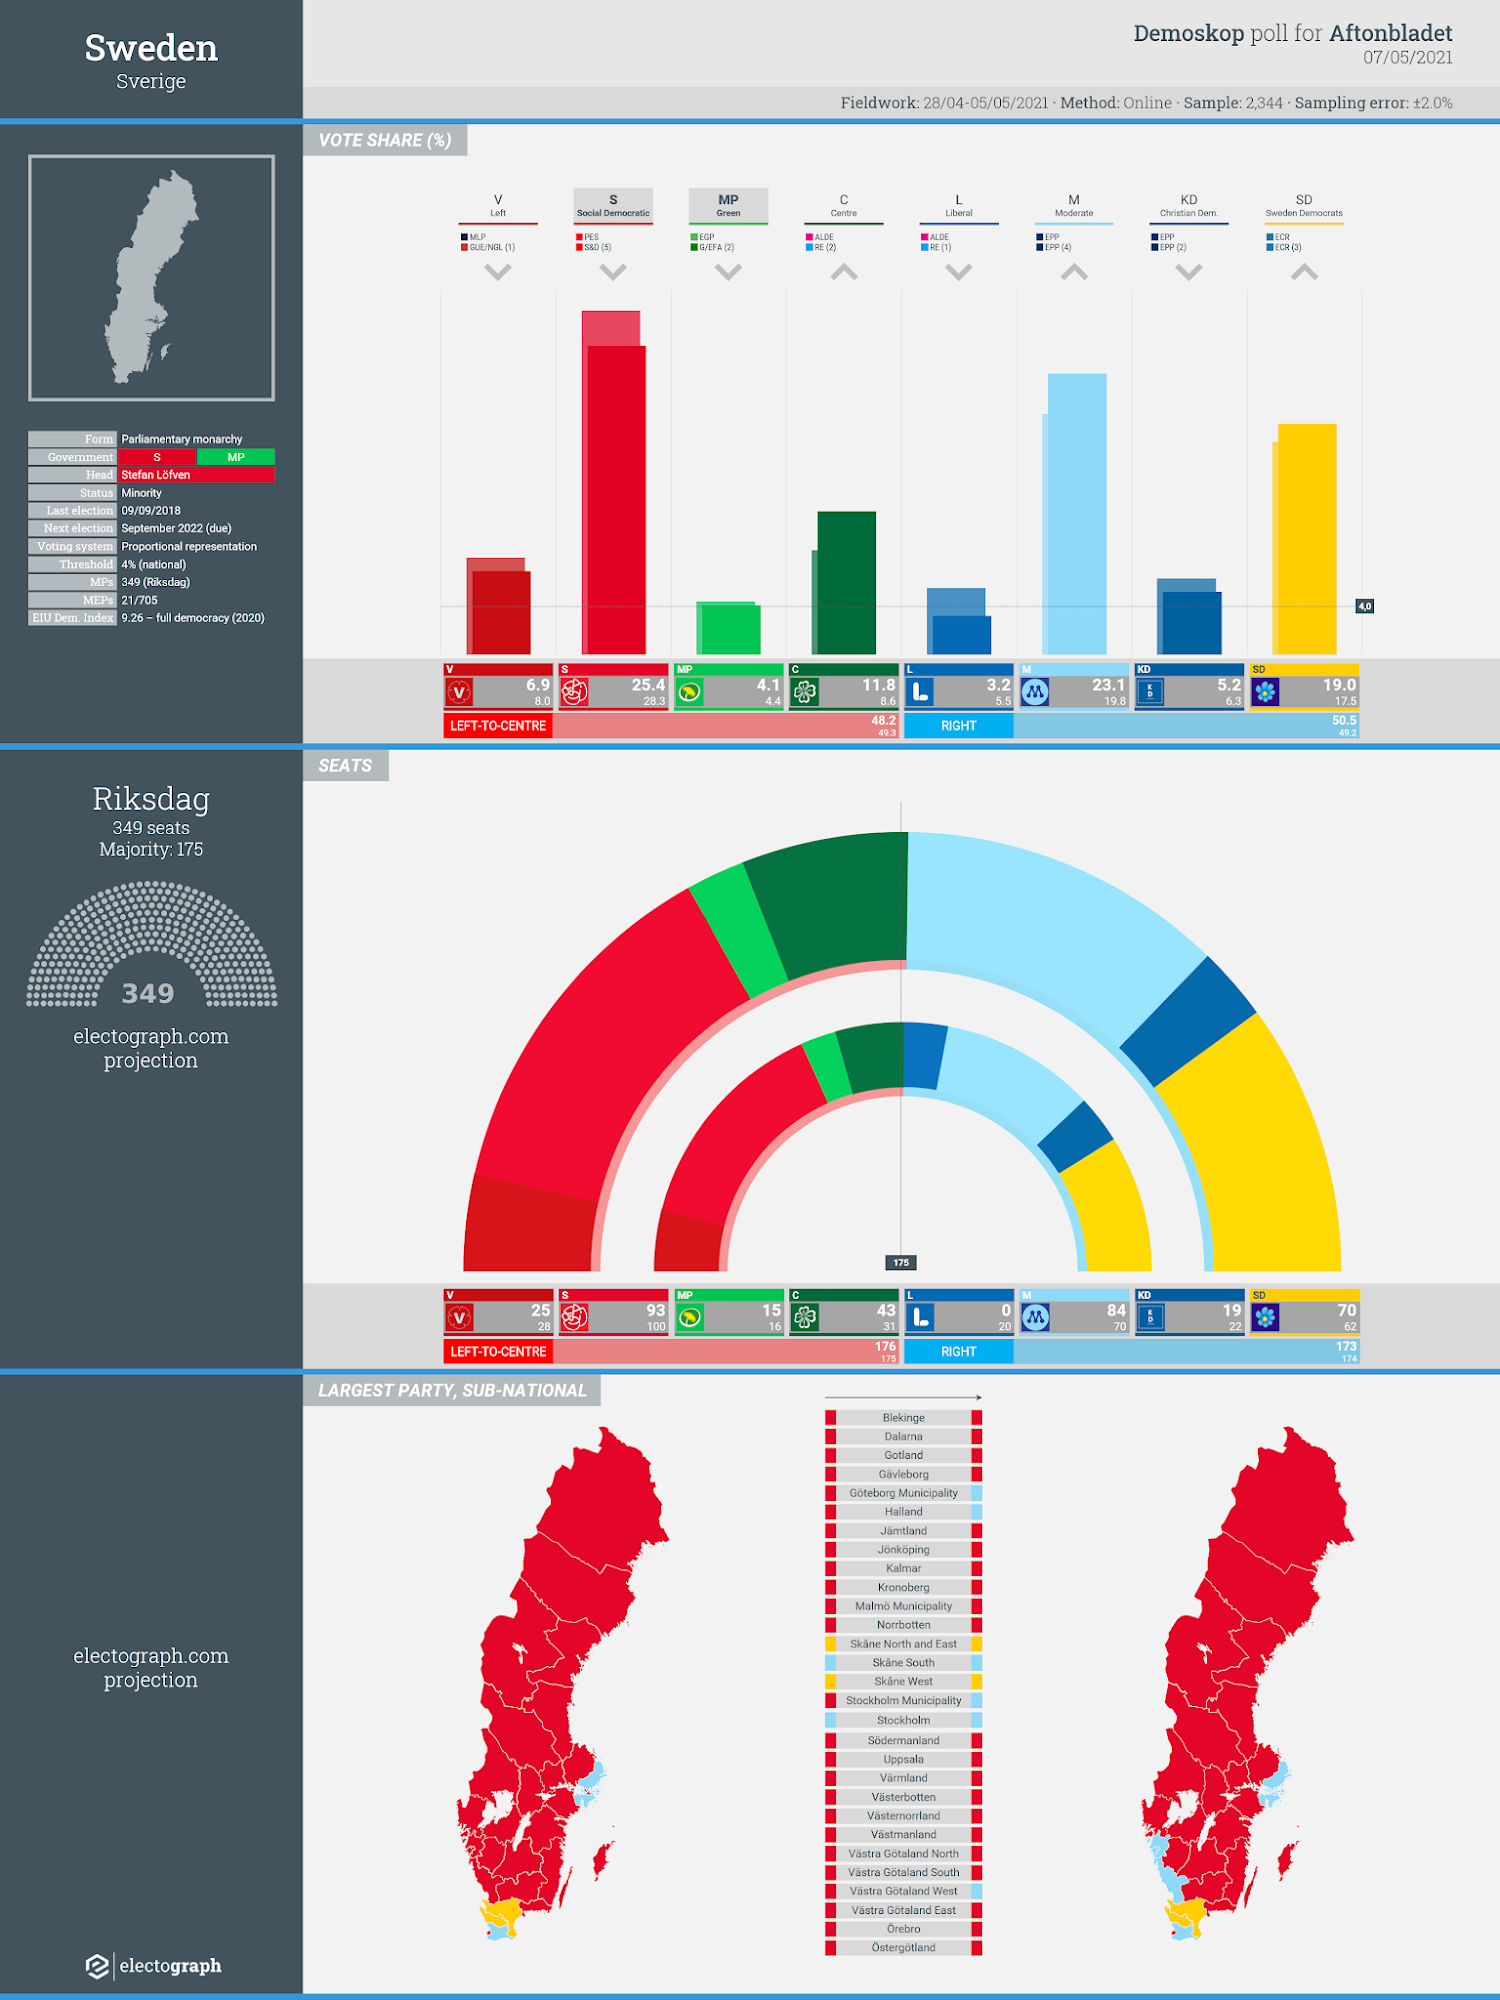 SWEDEN: Demoskop poll chart for Aftonbladet, 7 May 2021